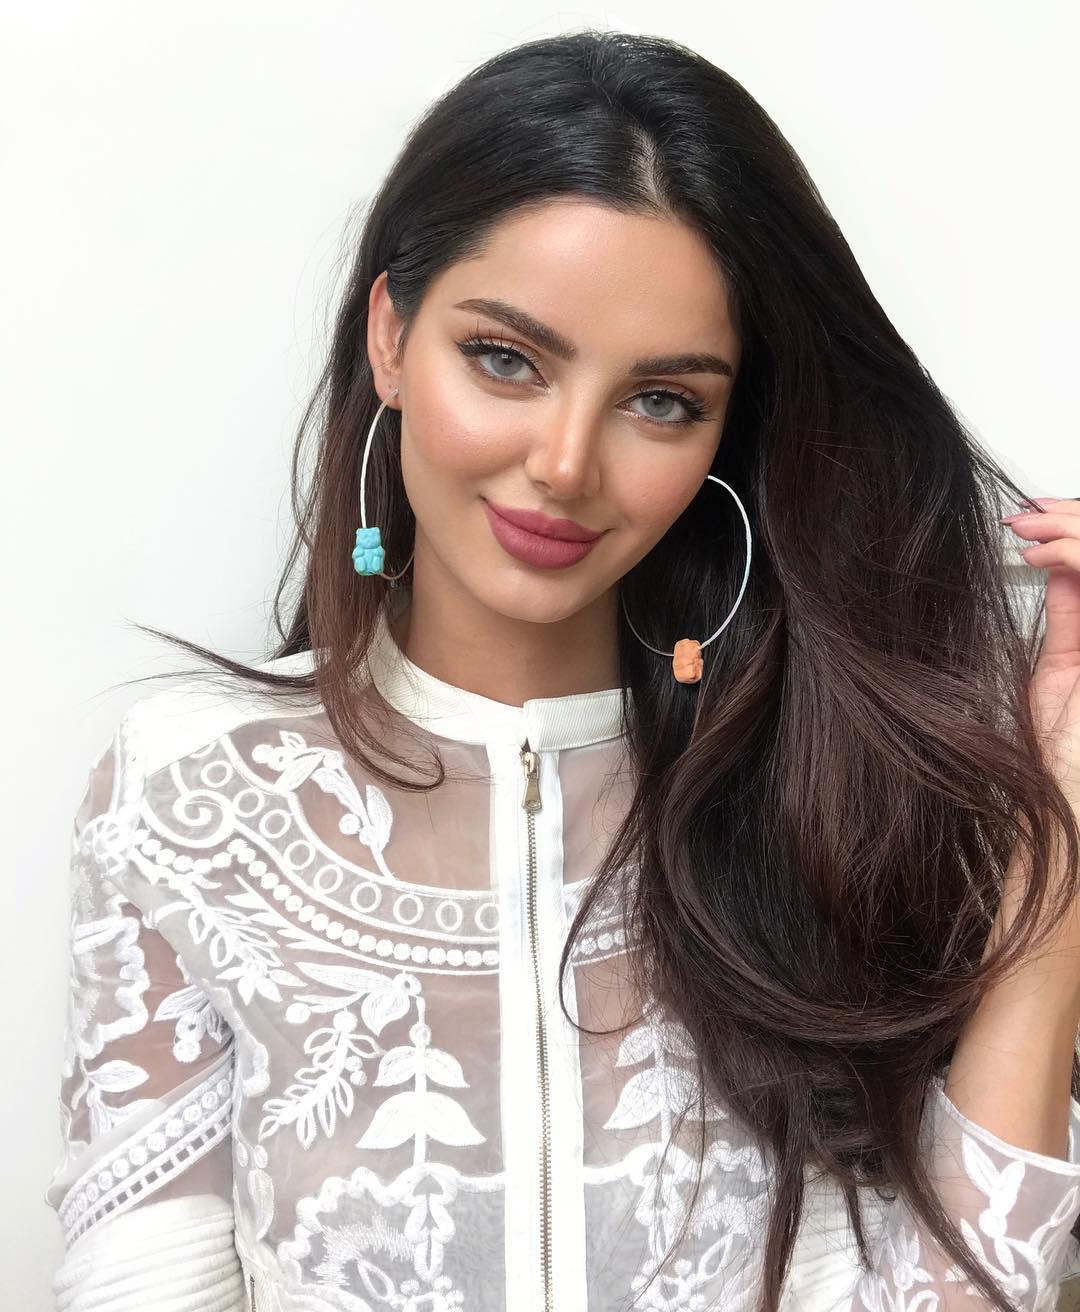 irani-girl-jucy-lip-pic